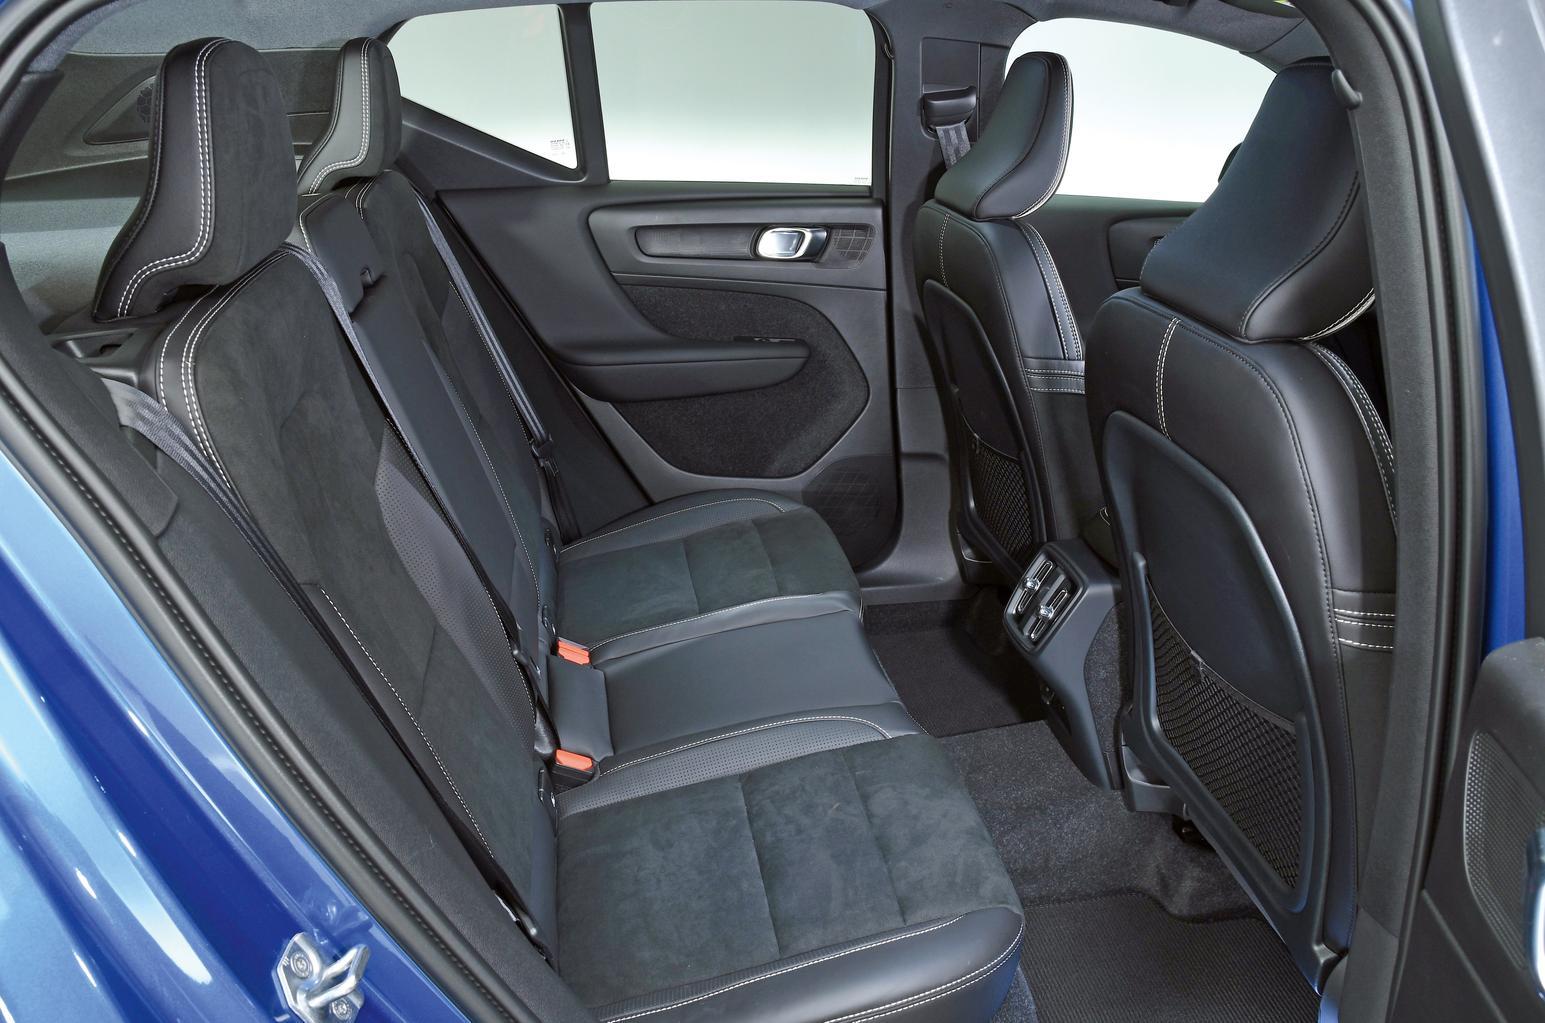 New BMW X2 & Jaguar E-Pace vs Volvo XC40